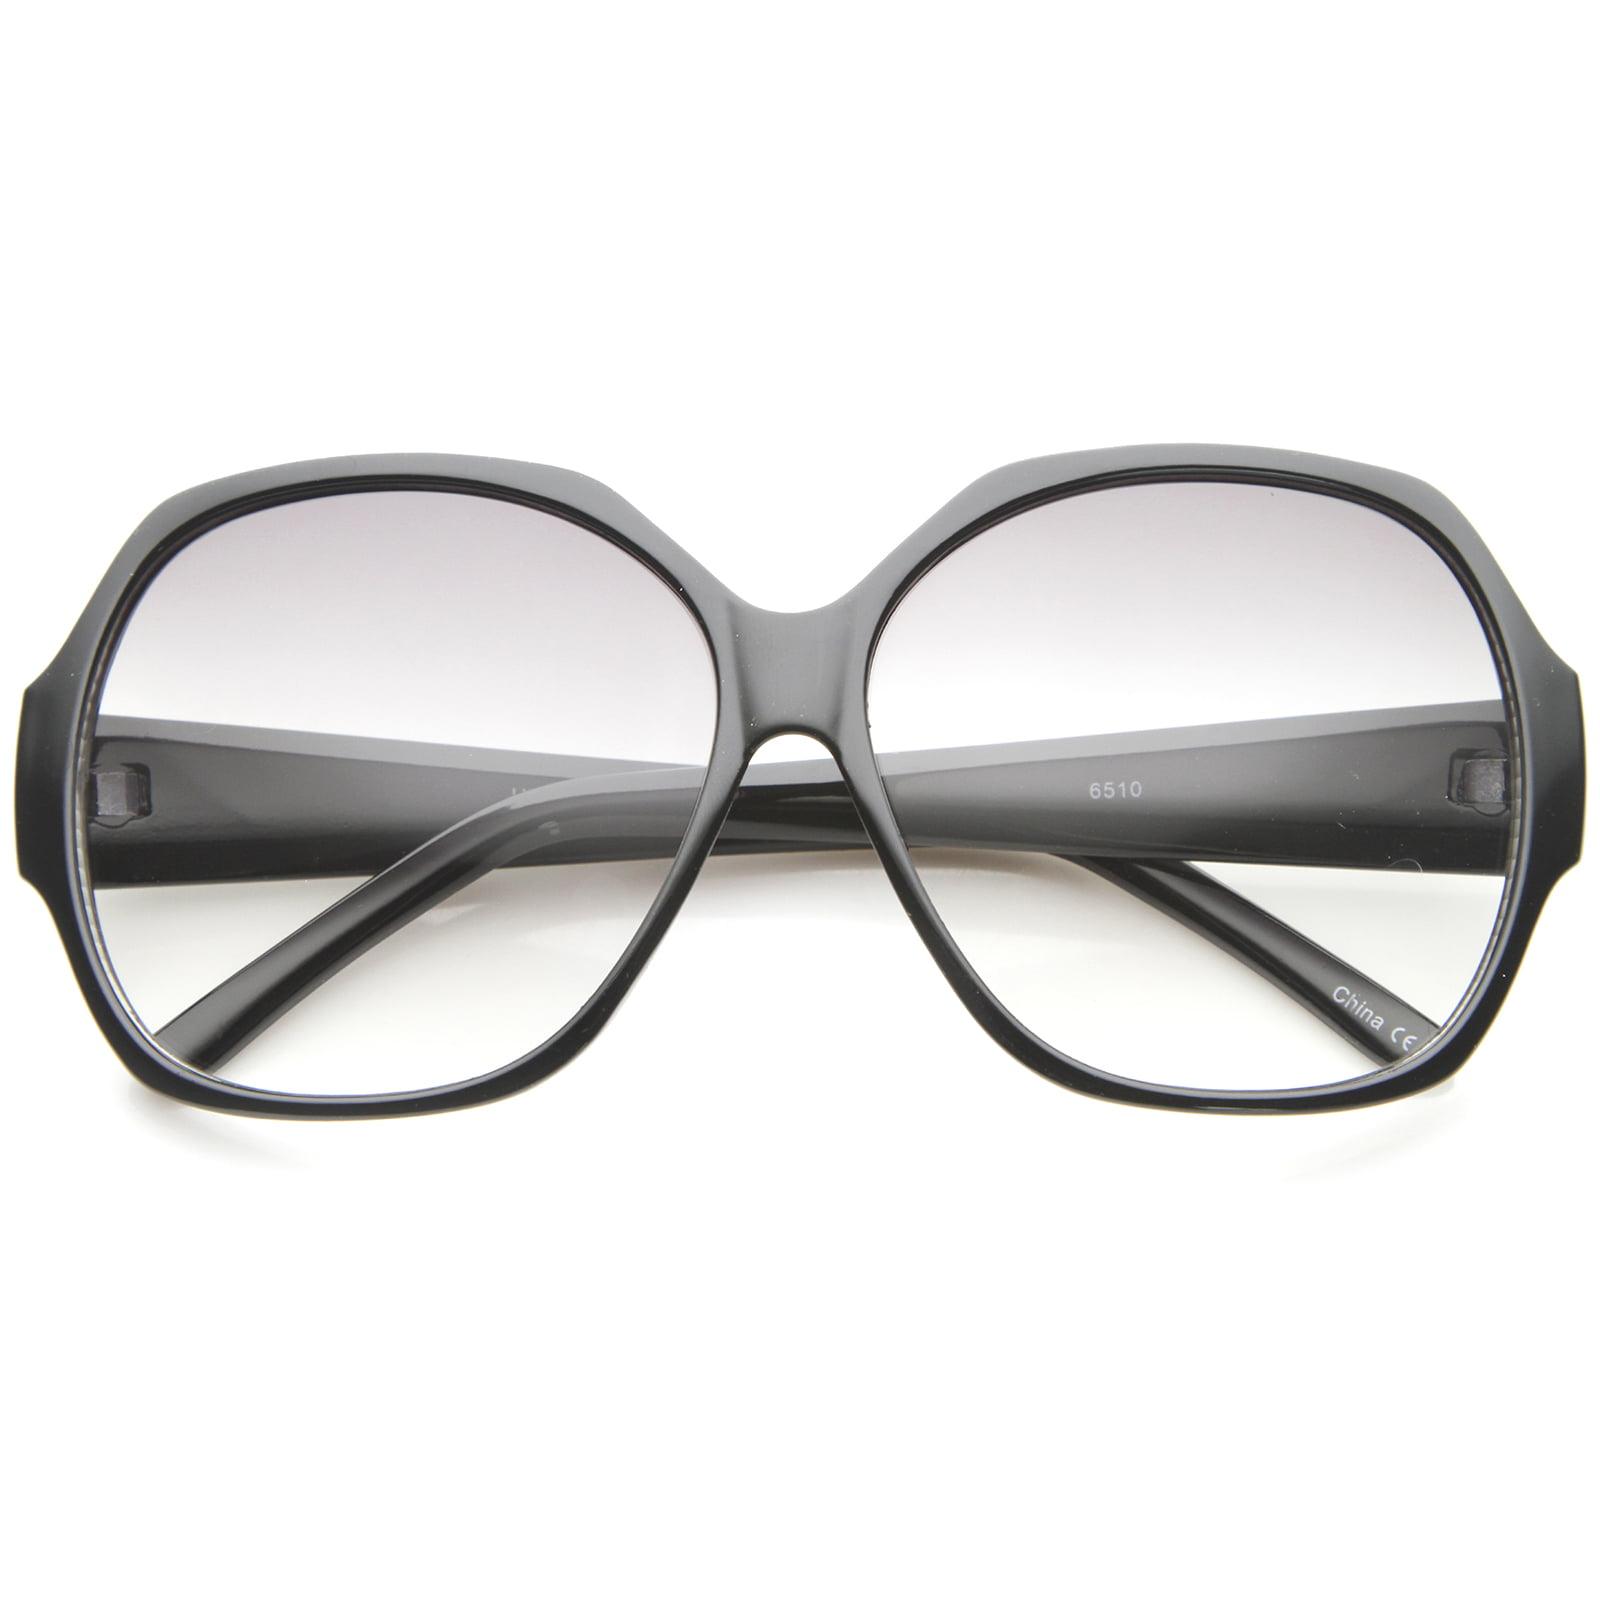 sunglassLA - Women's High Fashion Wide Temple Oversize Square Sunglasses - 58mm